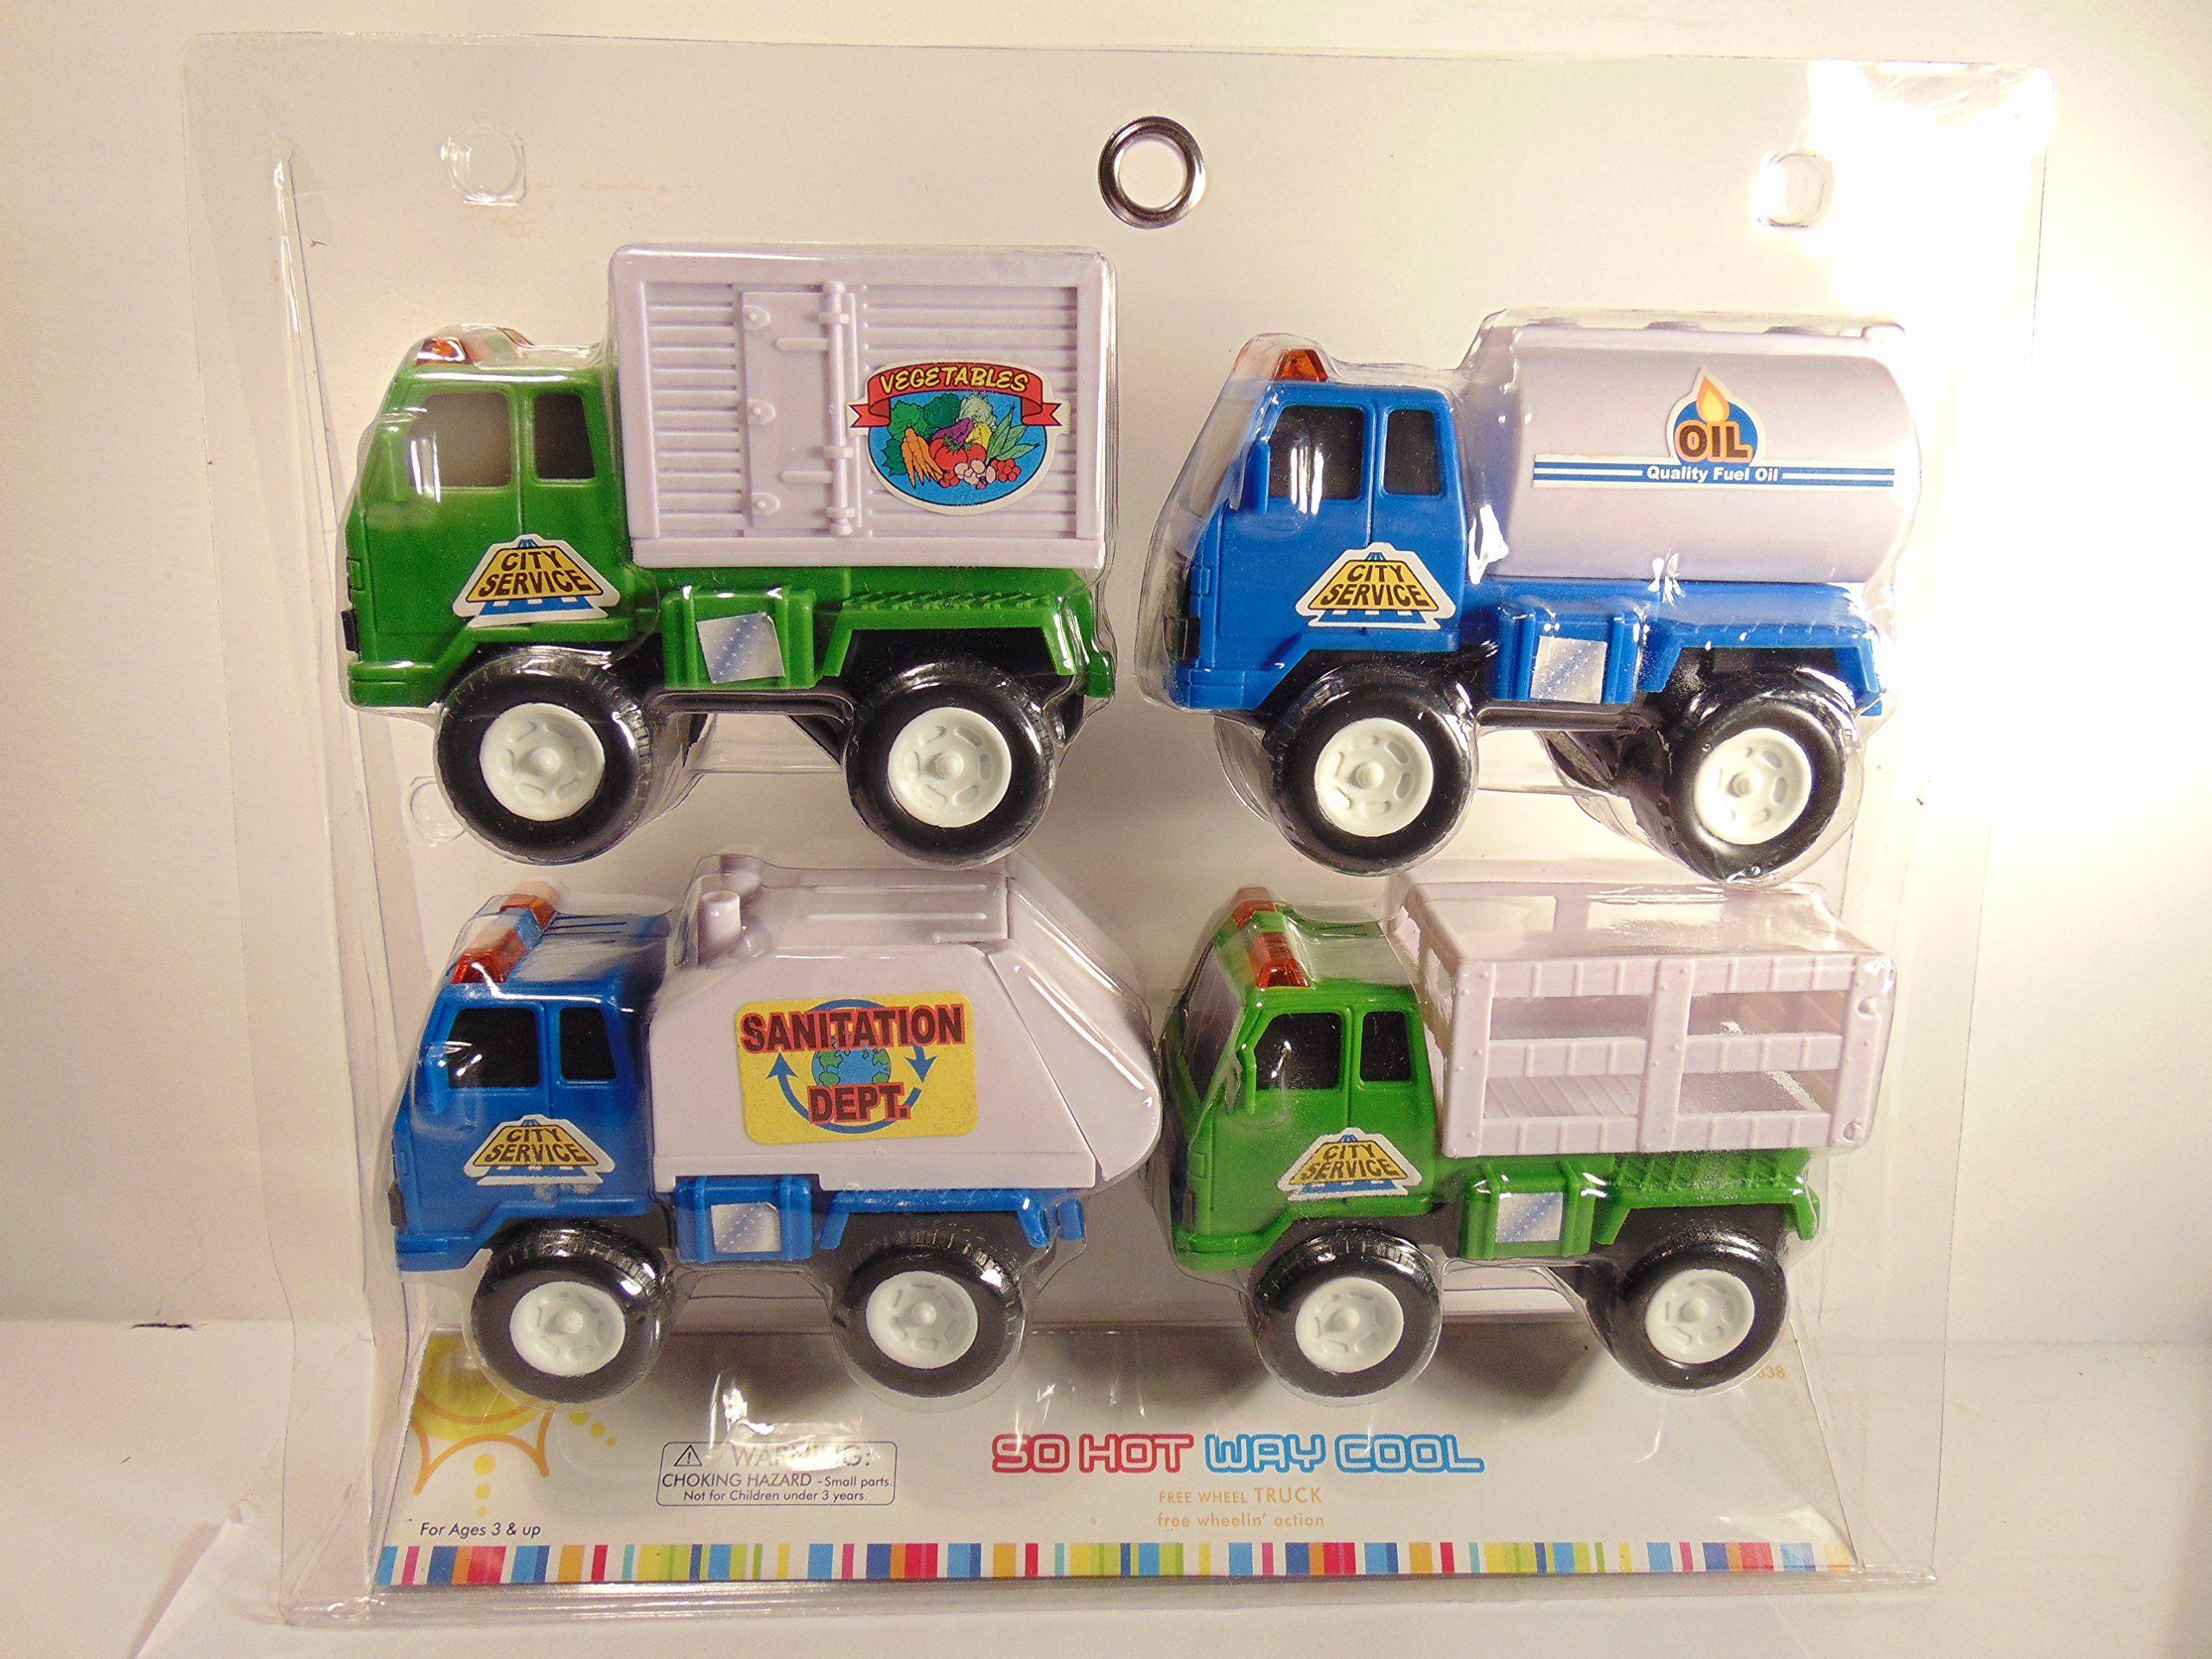 So Hot Way Cool City Service Free Wheel Toy Trucks Set of